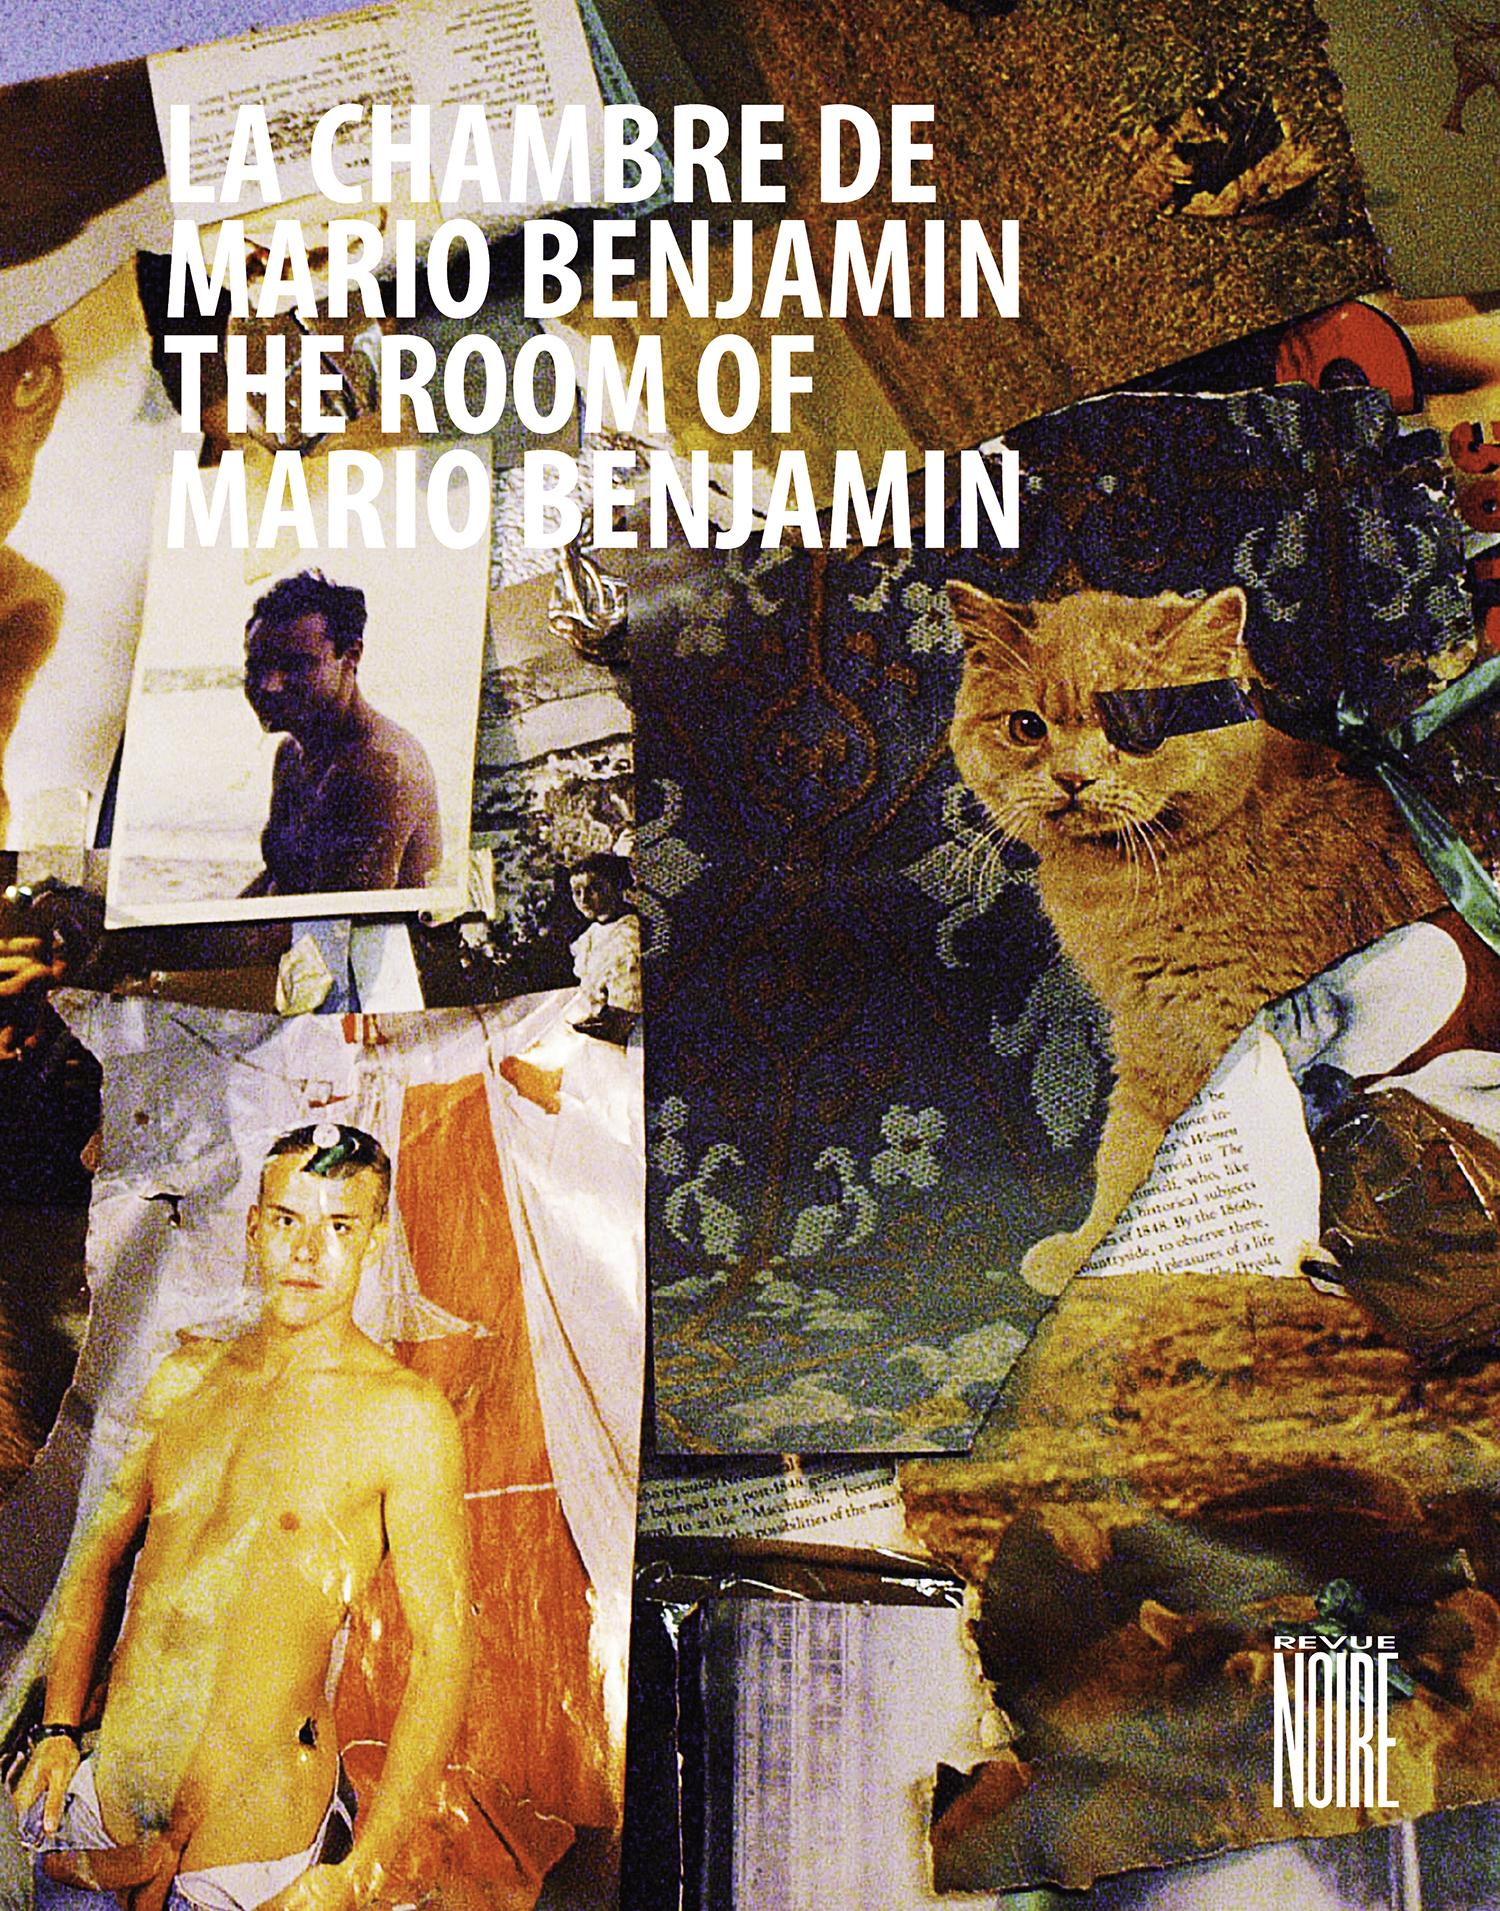 Livre 'La Chambre de Mario Benjamin' monographie, Revue Noire, 2012